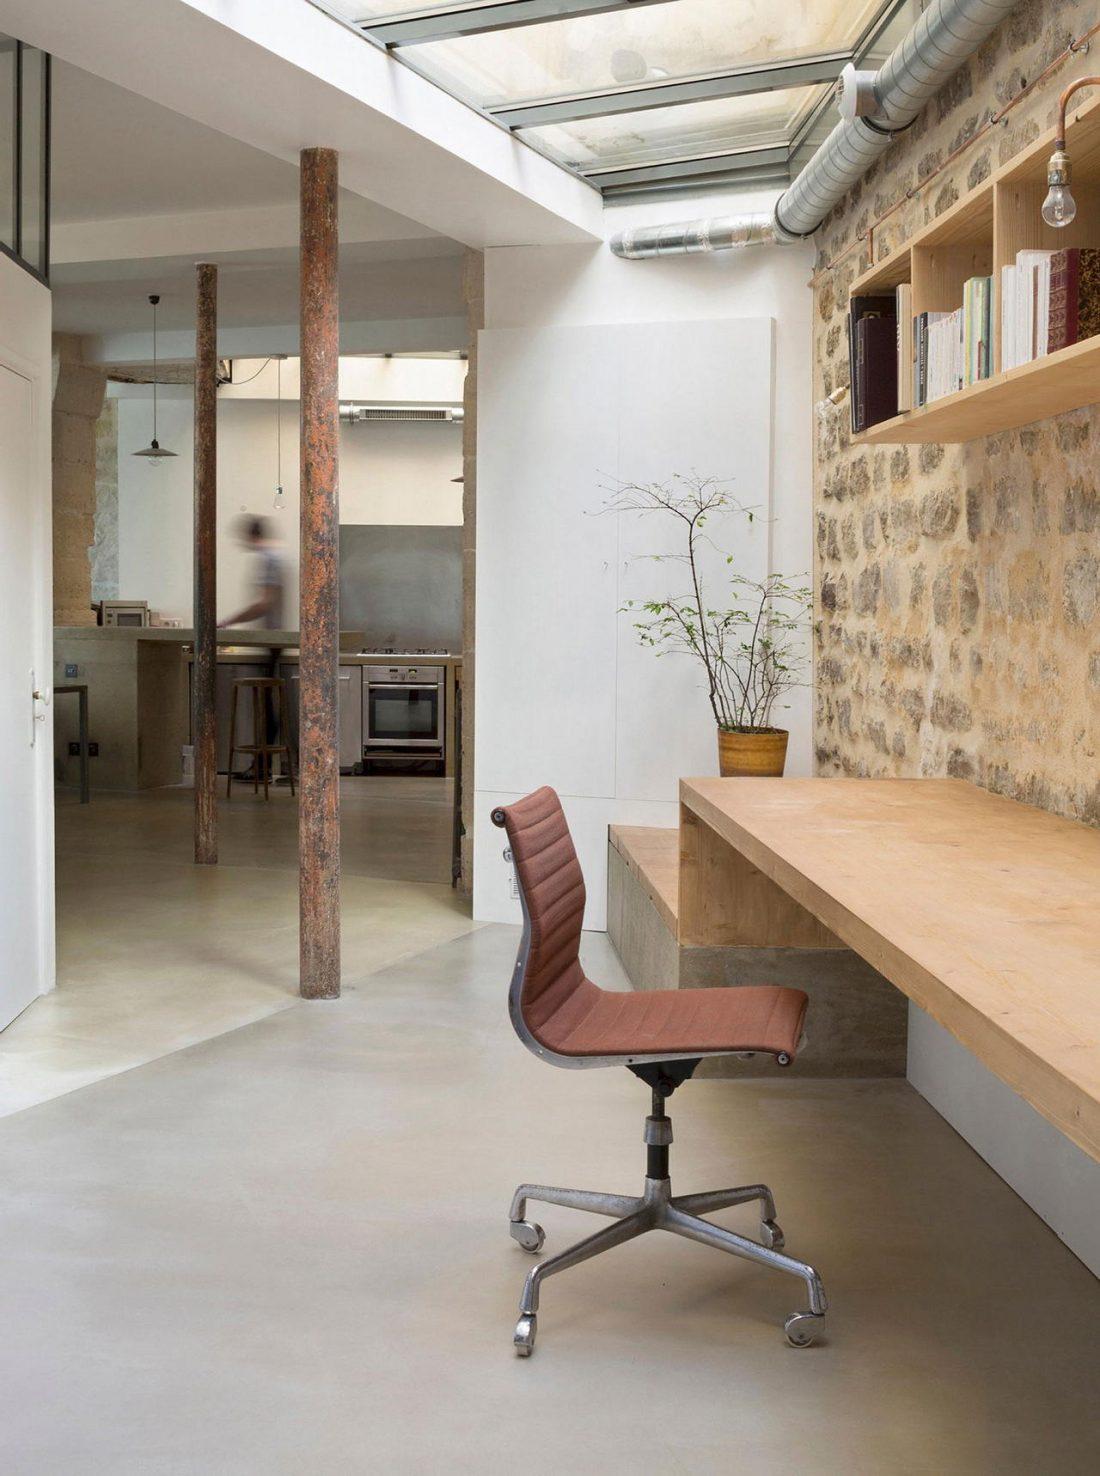 Дизайн интерьера квартиры в стиле лофт 46